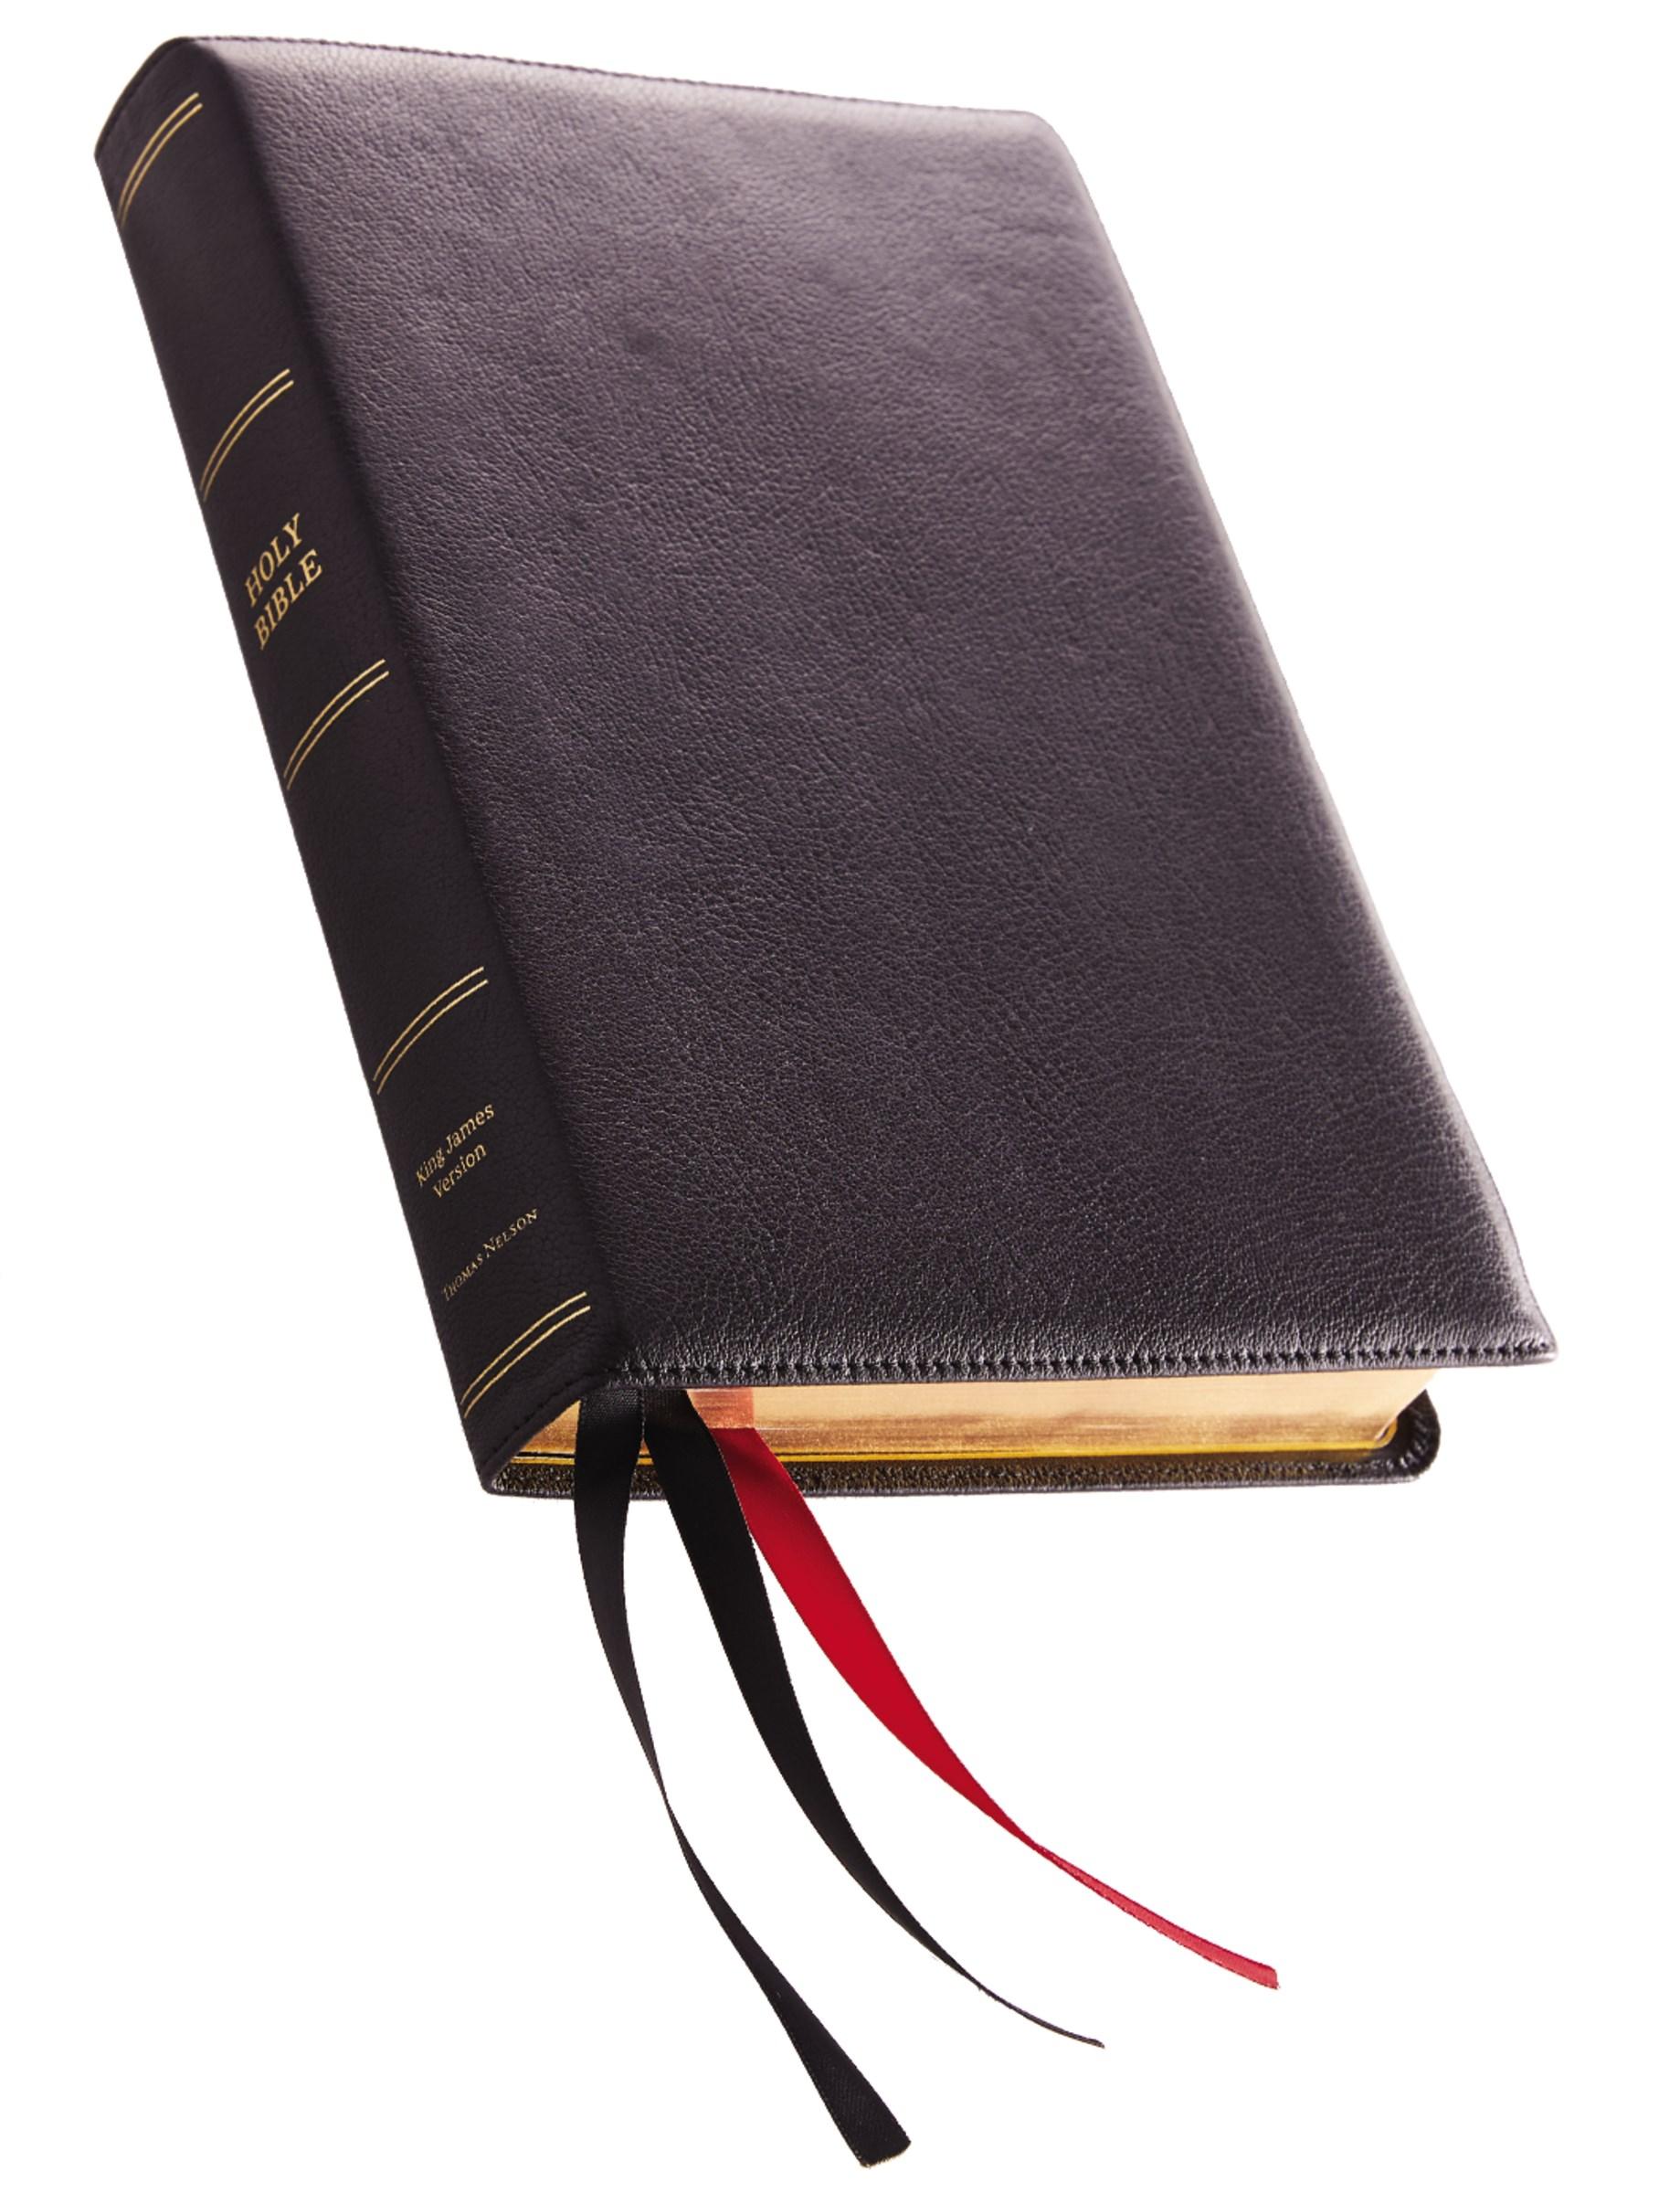 KJV Giant Print Reference Bible (Comfort Print)-Black Premium Leather